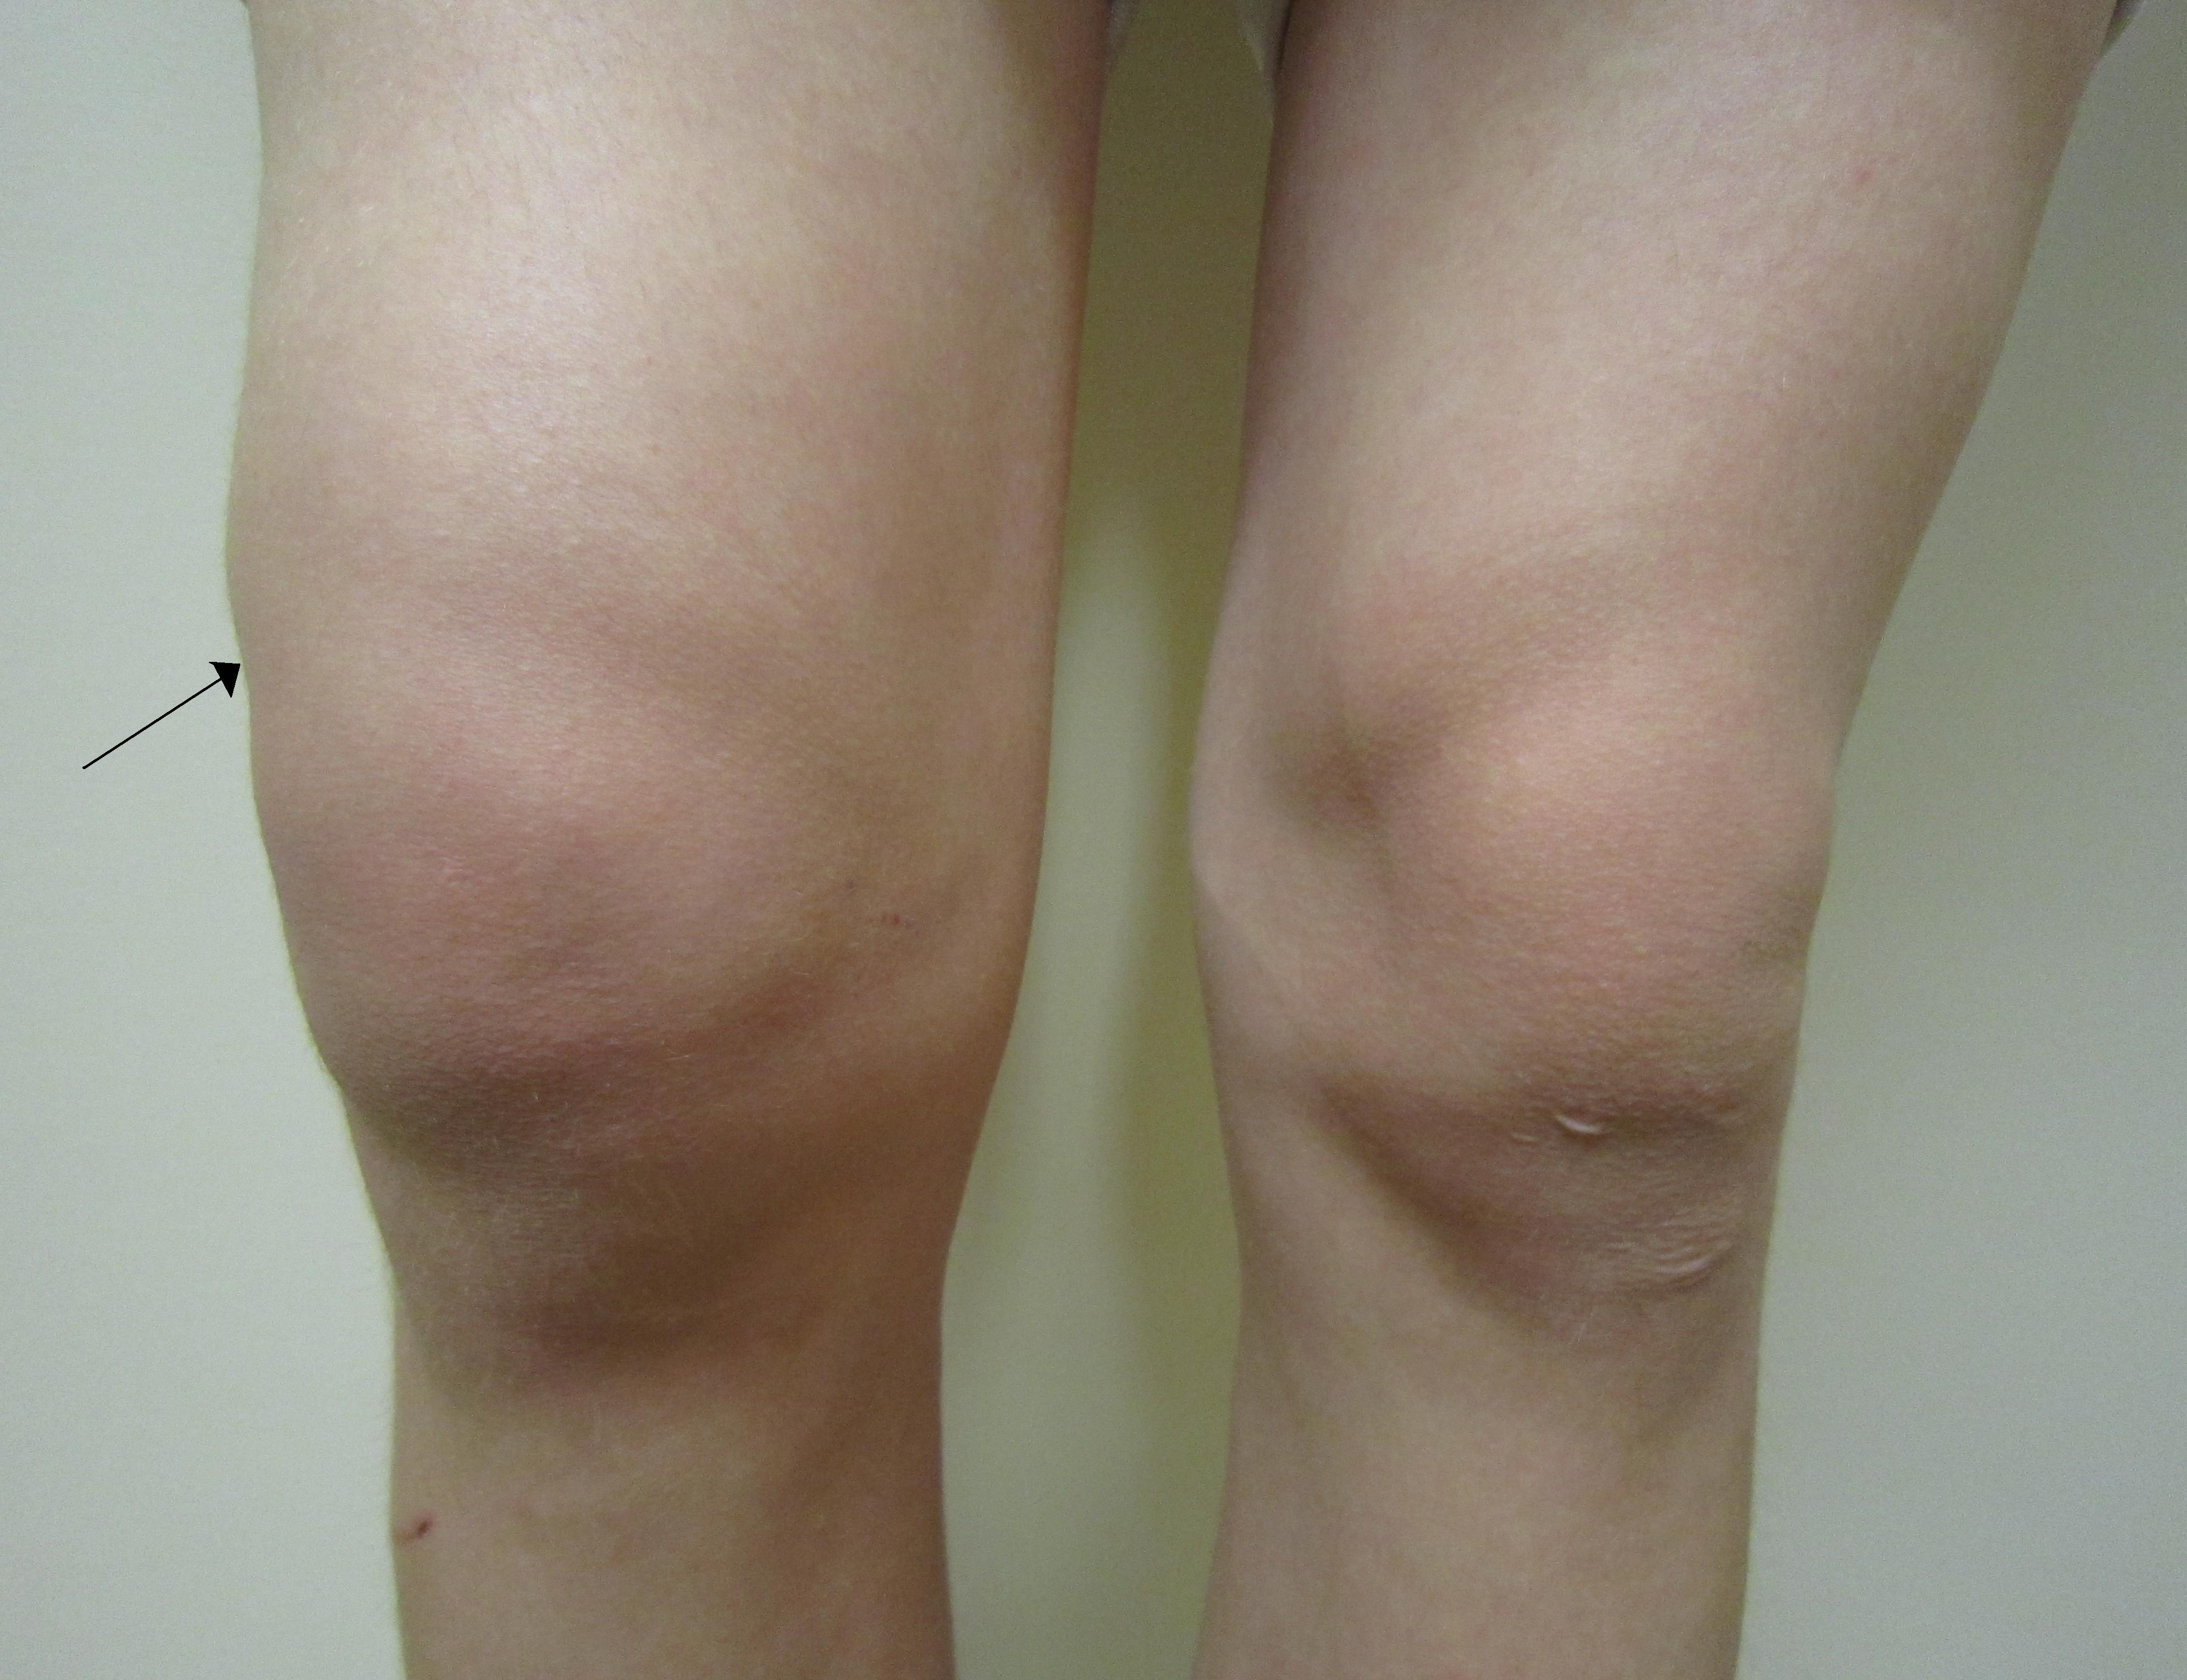 Genunchi supliment de reparații - Face clic pe o articulație cu durere